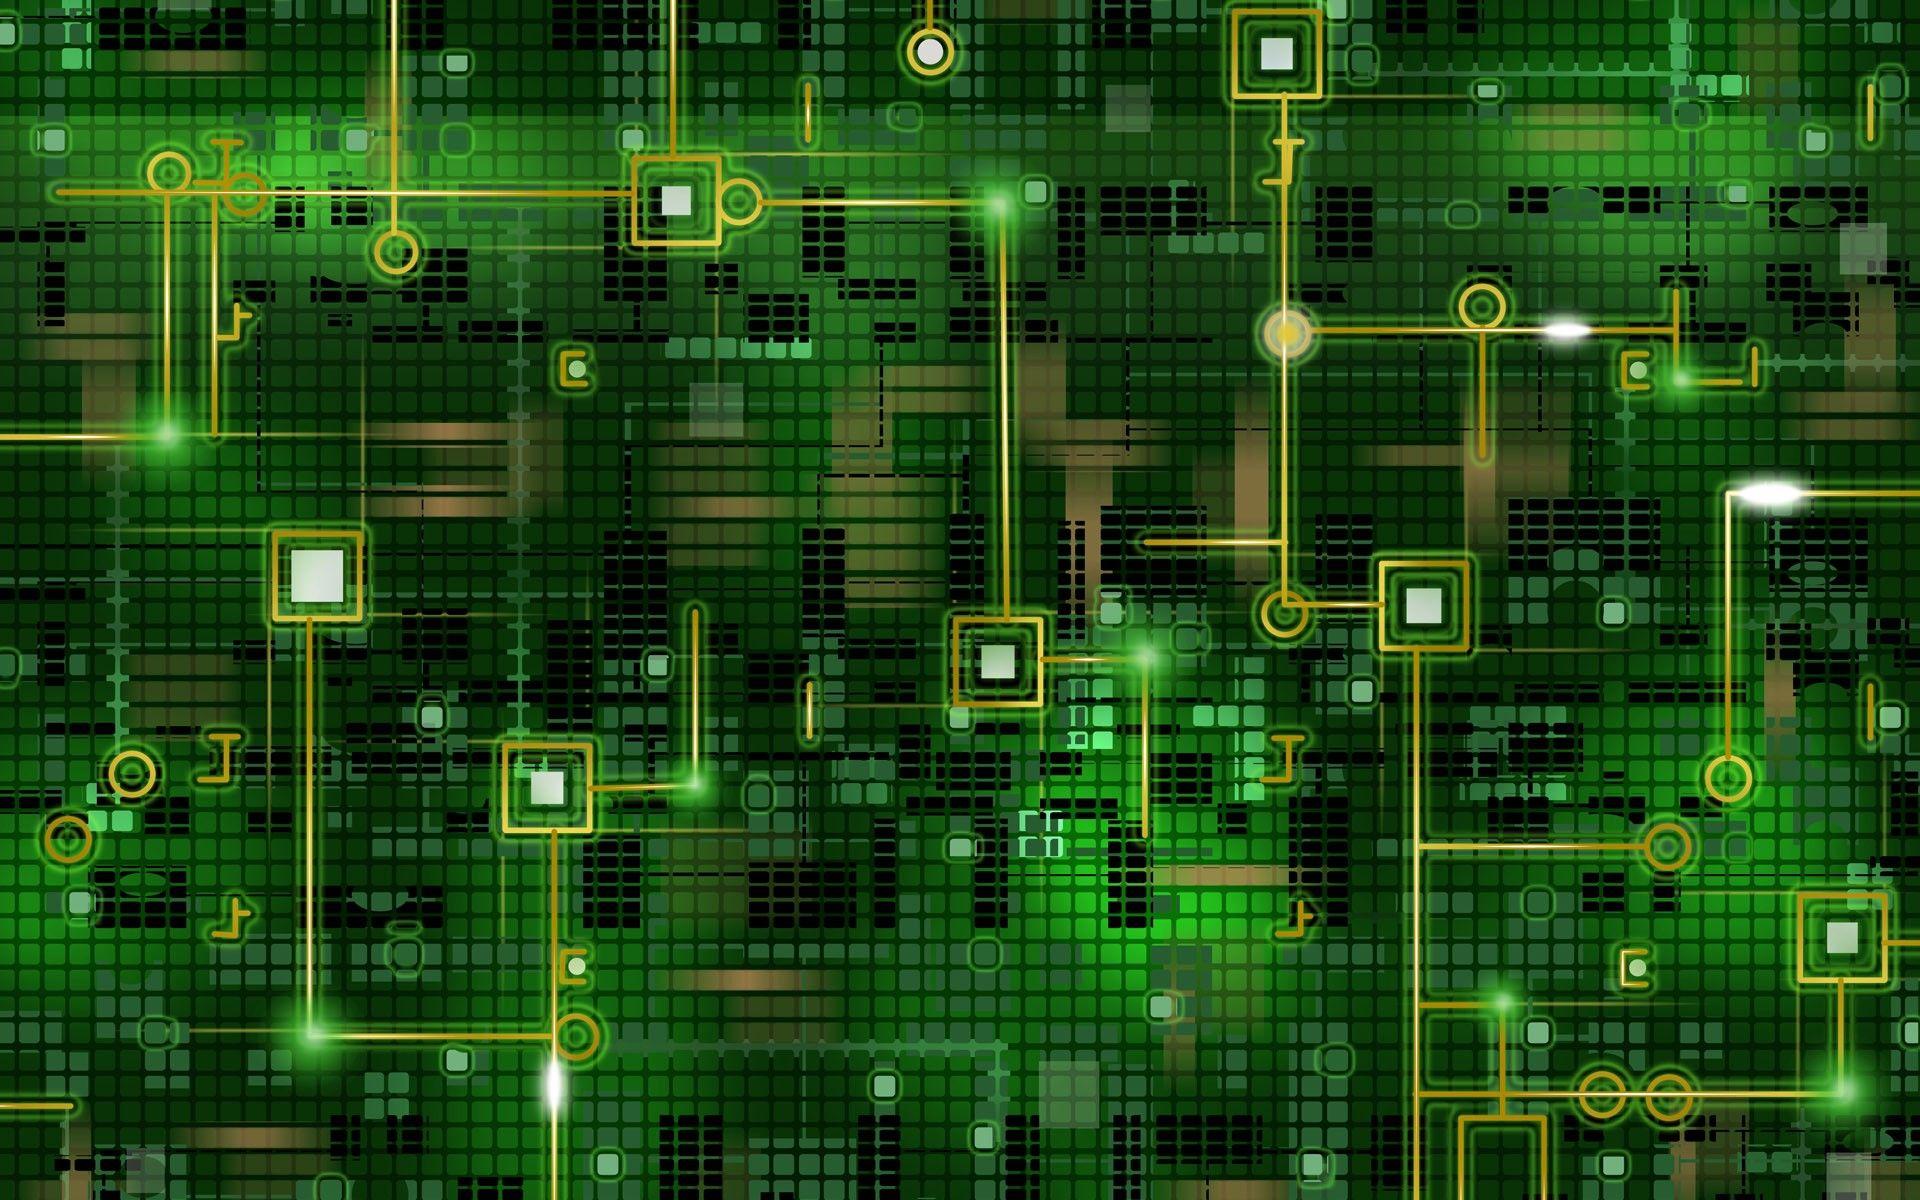 Hd wallpaper electronics - Widescreen Wallpaper Electronics Green Background Wallpapers Abstract